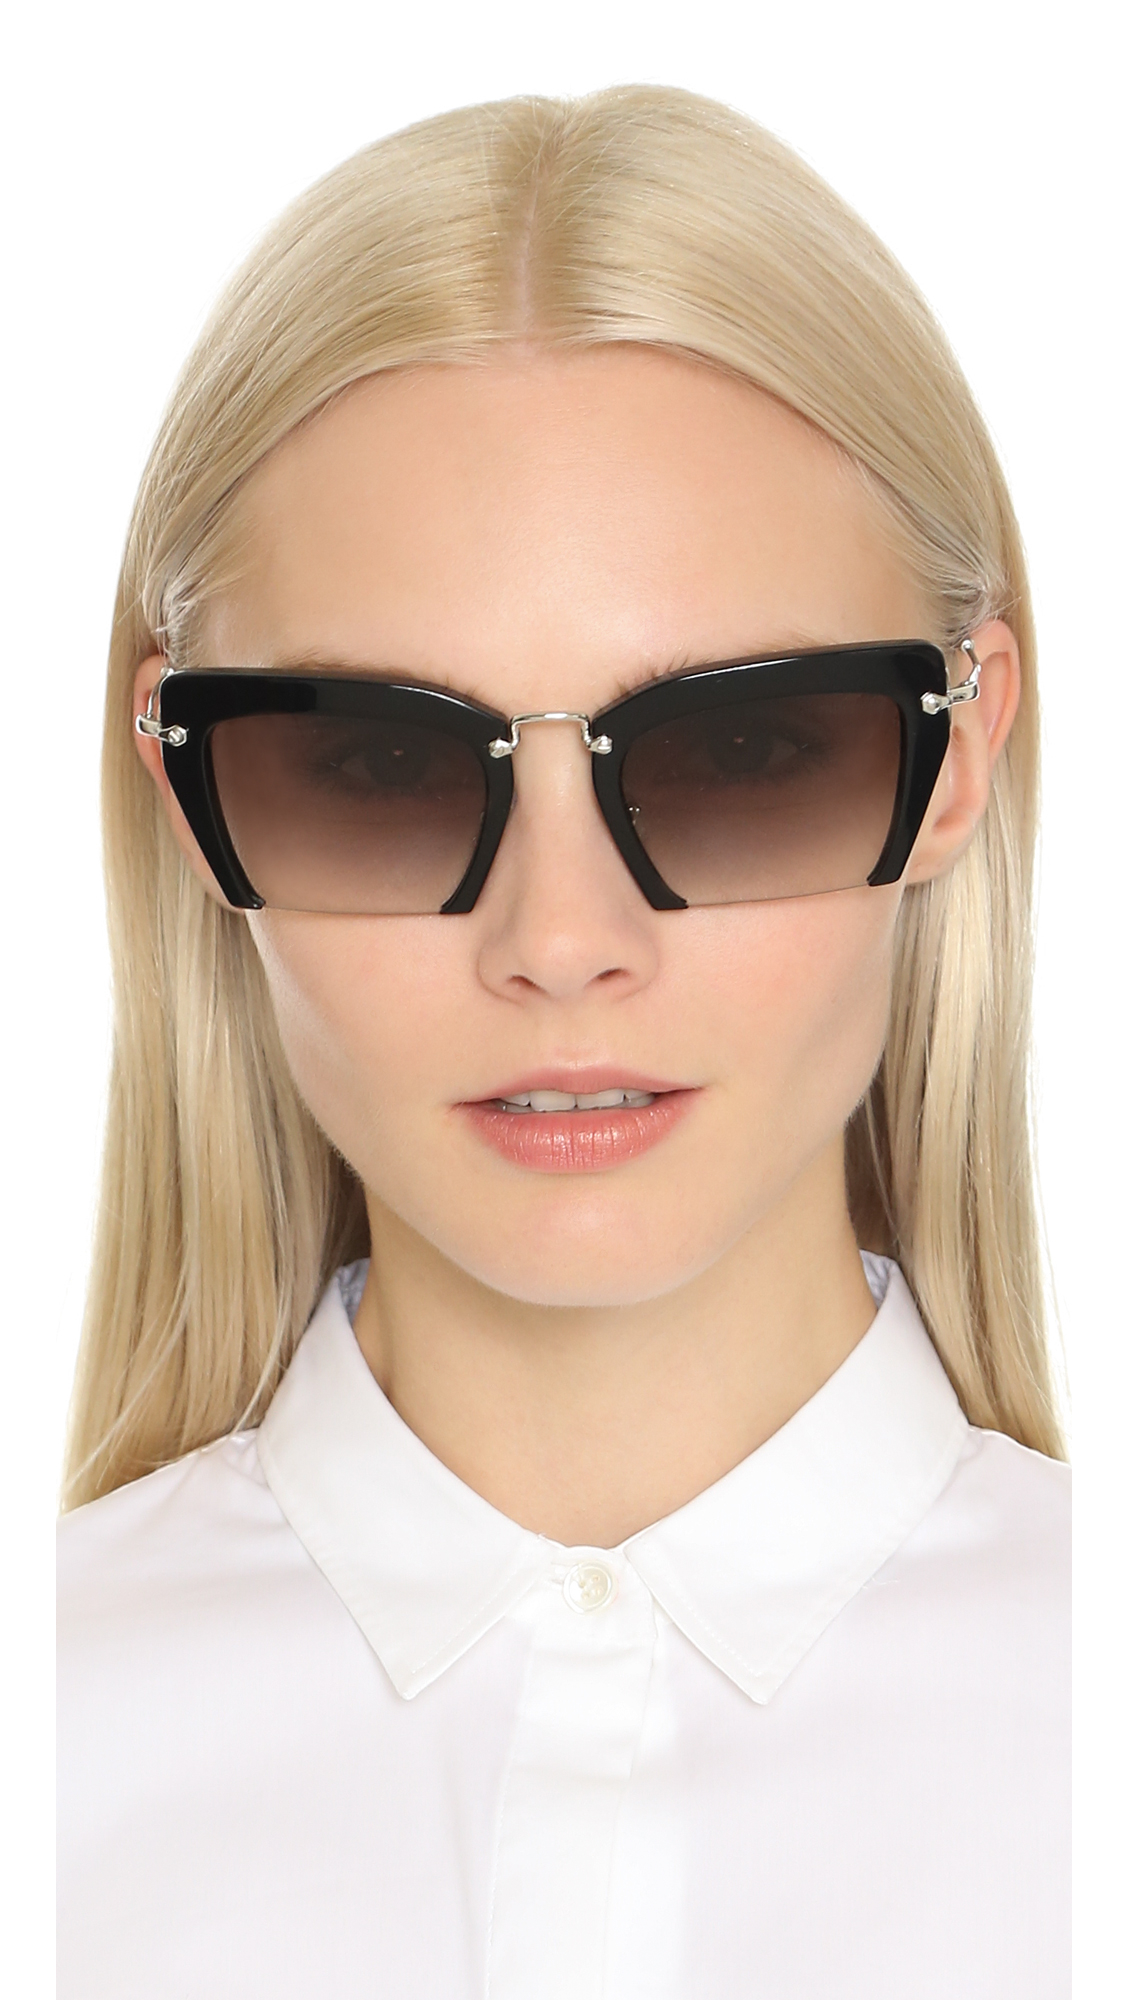 Lyst Miu Miu Cut Frame Sunglasses Black Grey Gradient